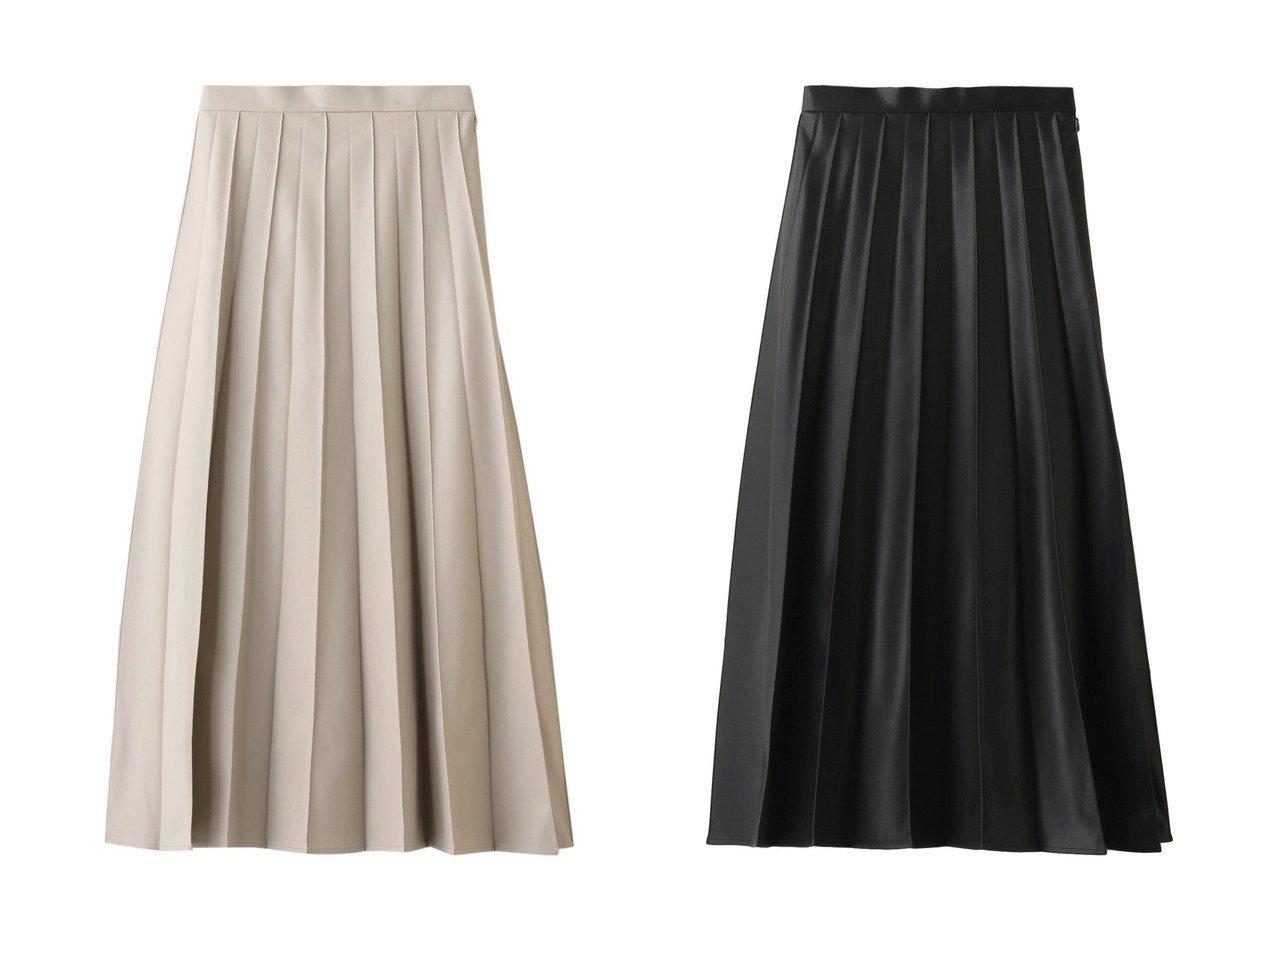 【allureville/アルアバイル】のフェイクレザータックプリーツスカート allurevilleのおすすめ!人気、トレンド・レディースファッションの通販 おすすめで人気の流行・トレンド、ファッションの通販商品 メンズファッション・キッズファッション・インテリア・家具・レディースファッション・服の通販 founy(ファニー) https://founy.com/ ファッション Fashion レディースファッション WOMEN スカート Skirt プリーツスカート Pleated Skirts 2021年 2021 2021 春夏 S/S SS Spring/Summer 2021 S/S 春夏 SS Spring/Summer エレガント ガーリー フェイクレザー プリーツ ロング 春 Spring |ID:crp329100000019546